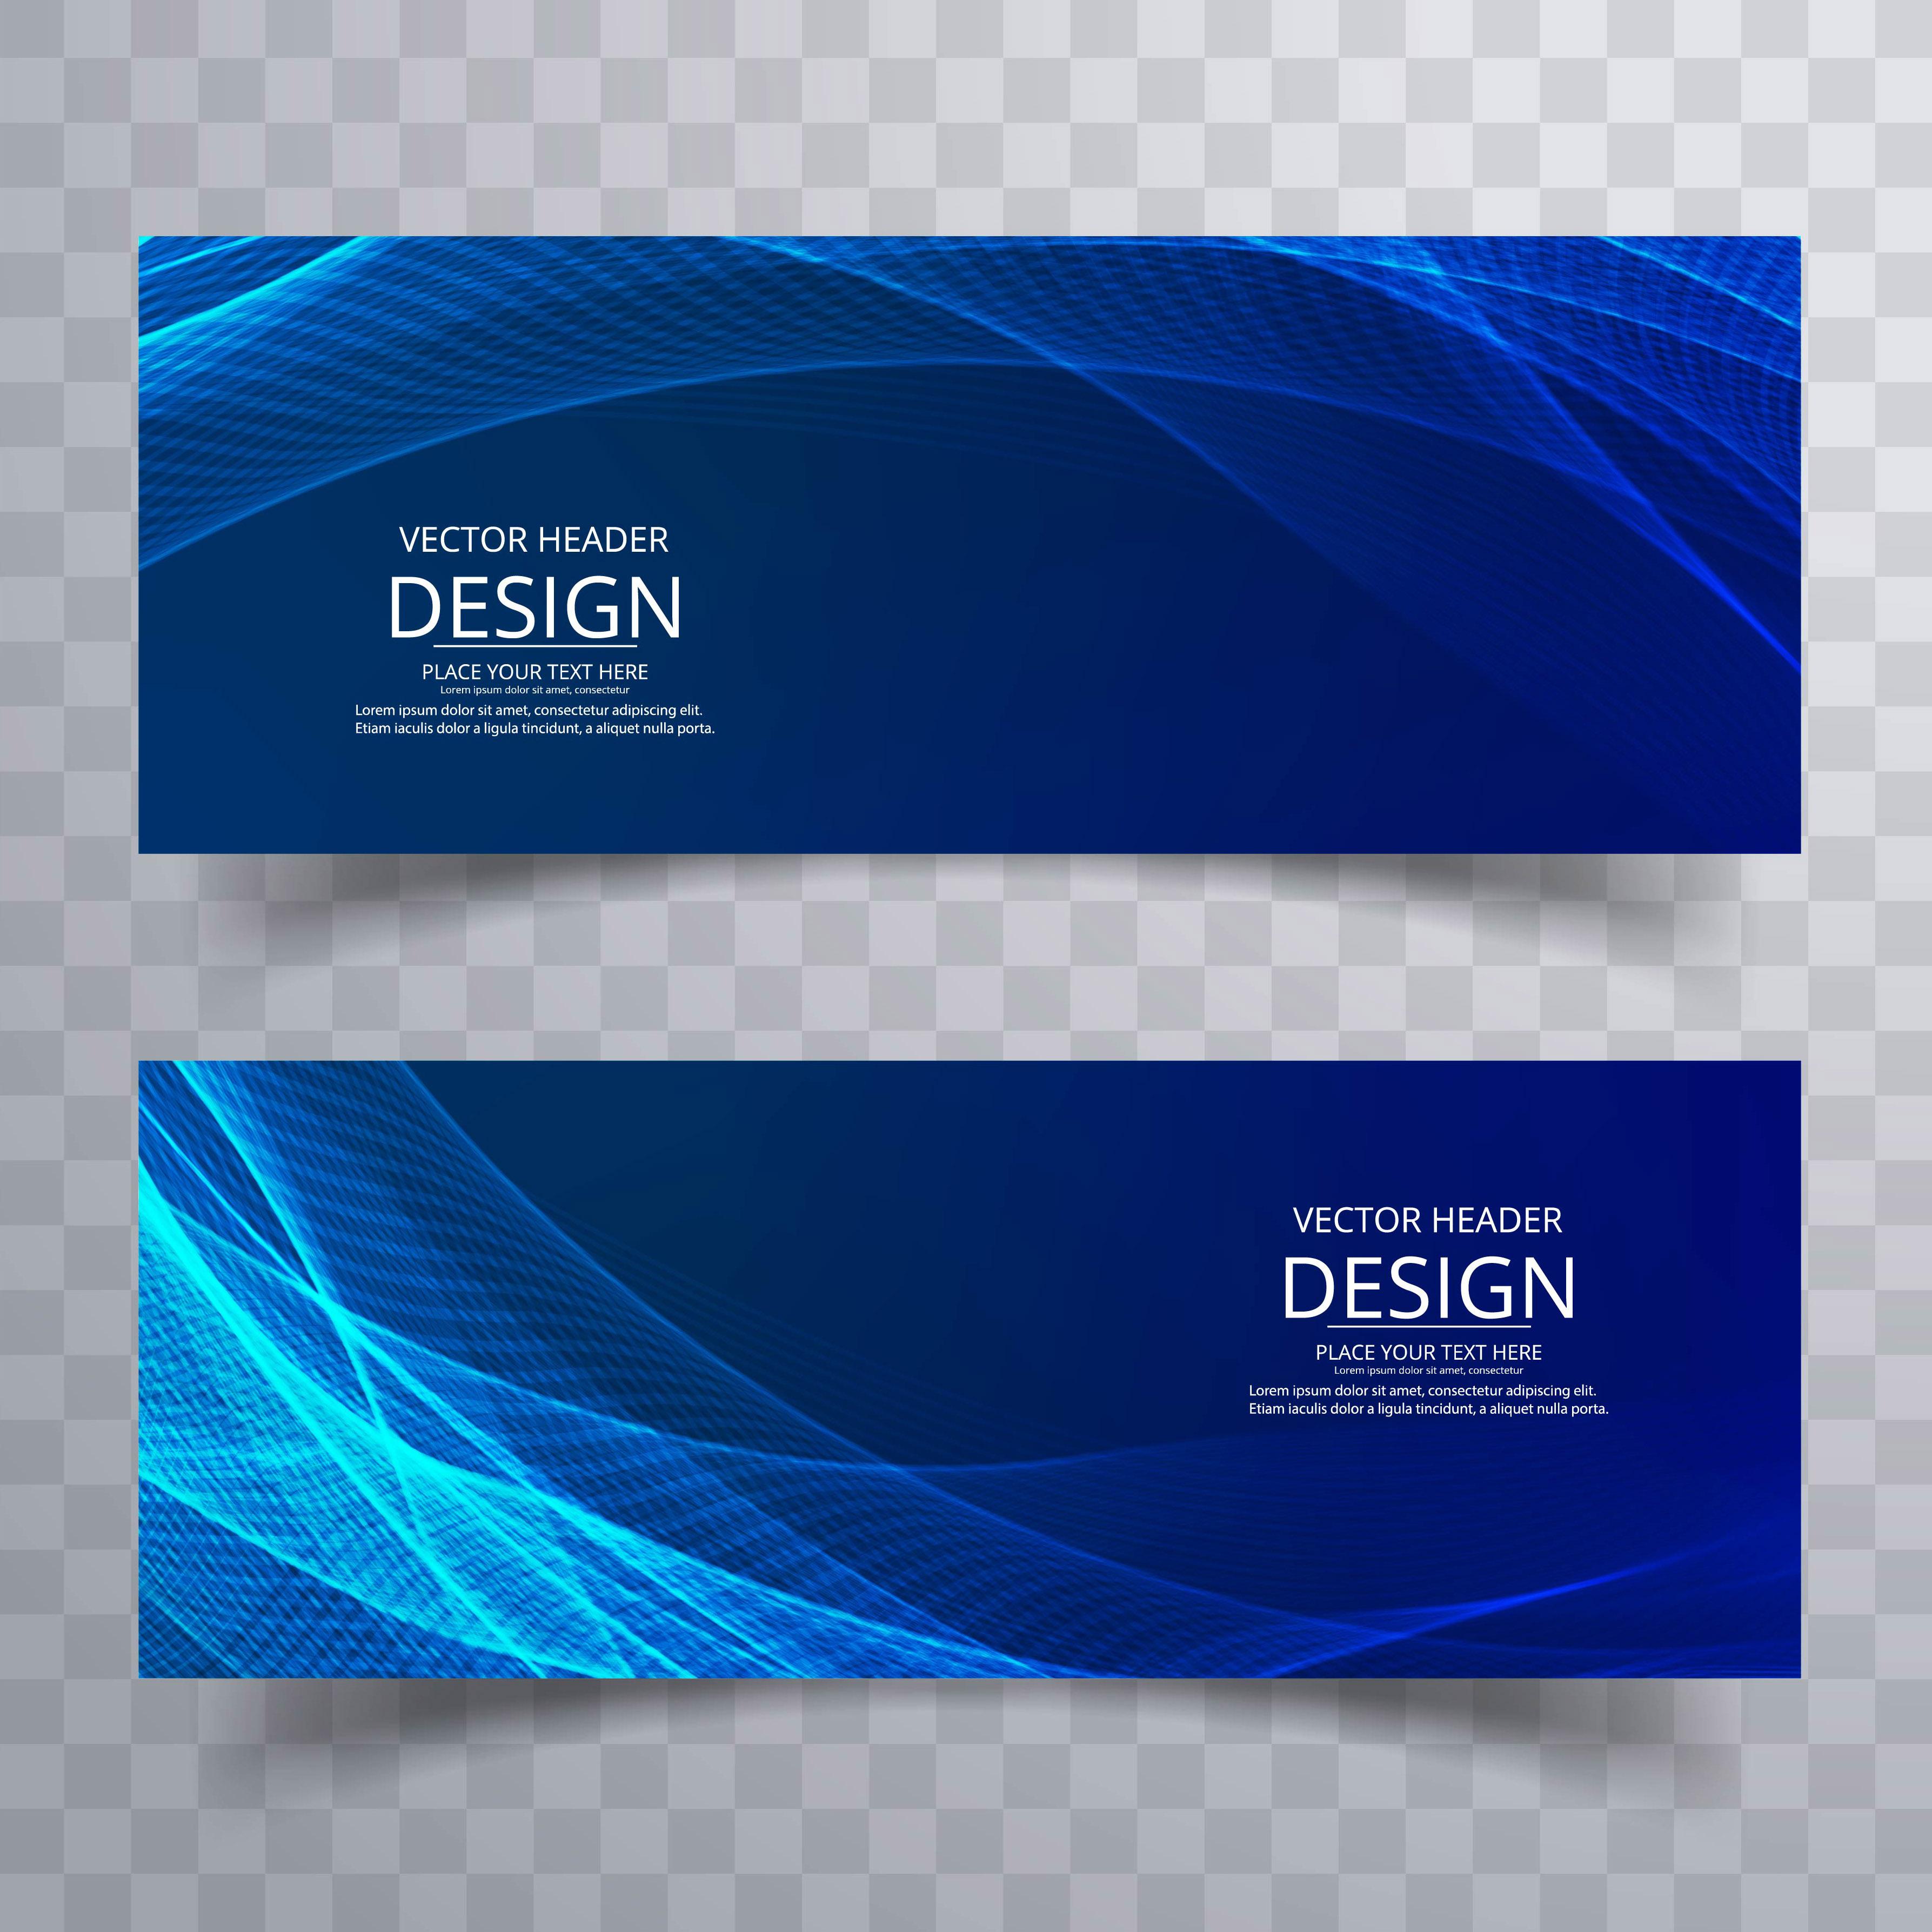 Vector Illustration Web Designs: Modern Blue Wavy Banners Set Design